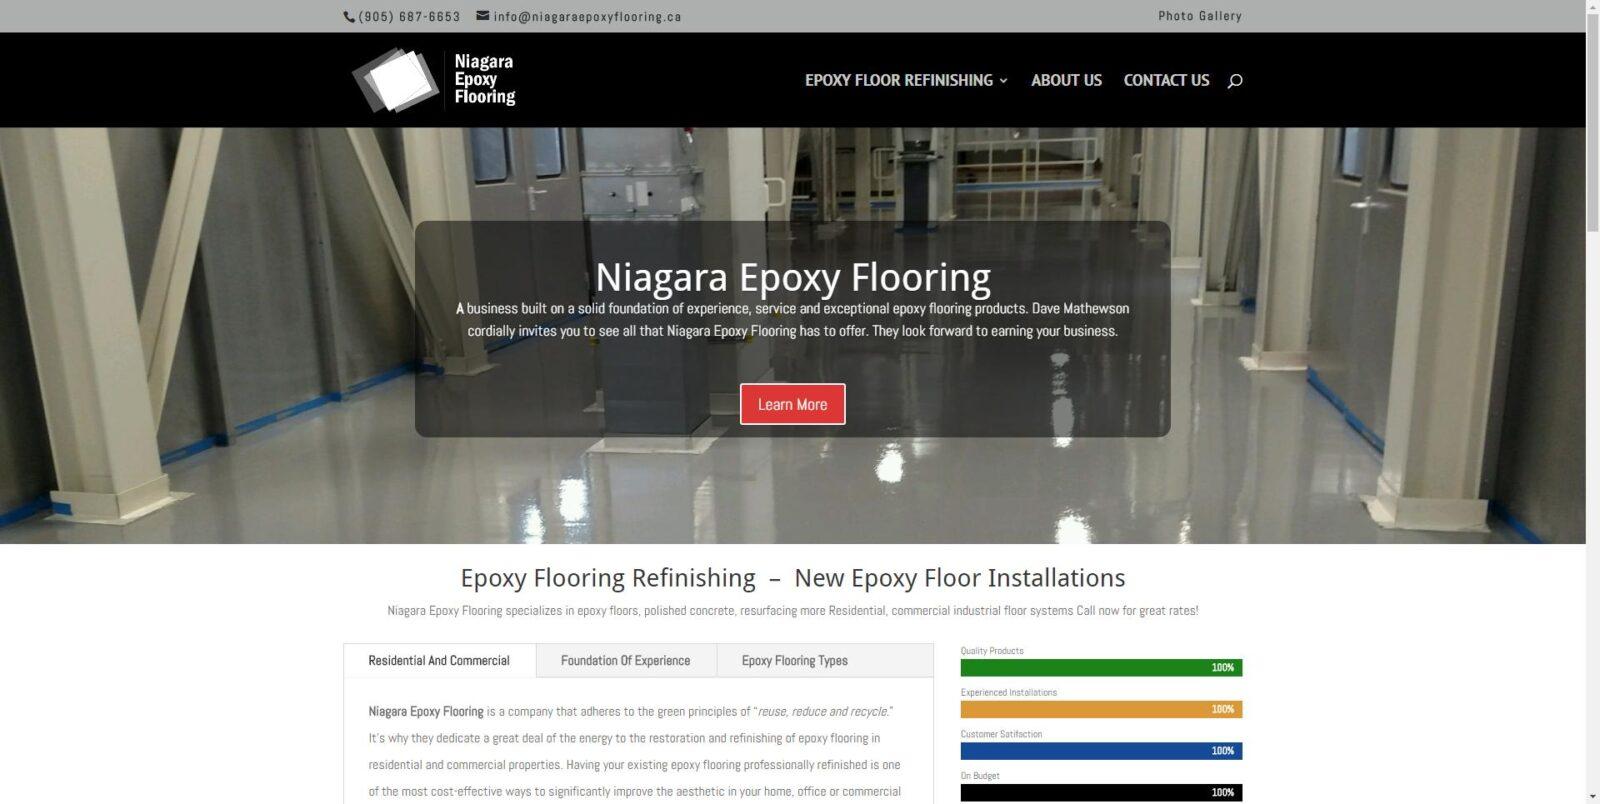 Niagara Epoxy Flooring